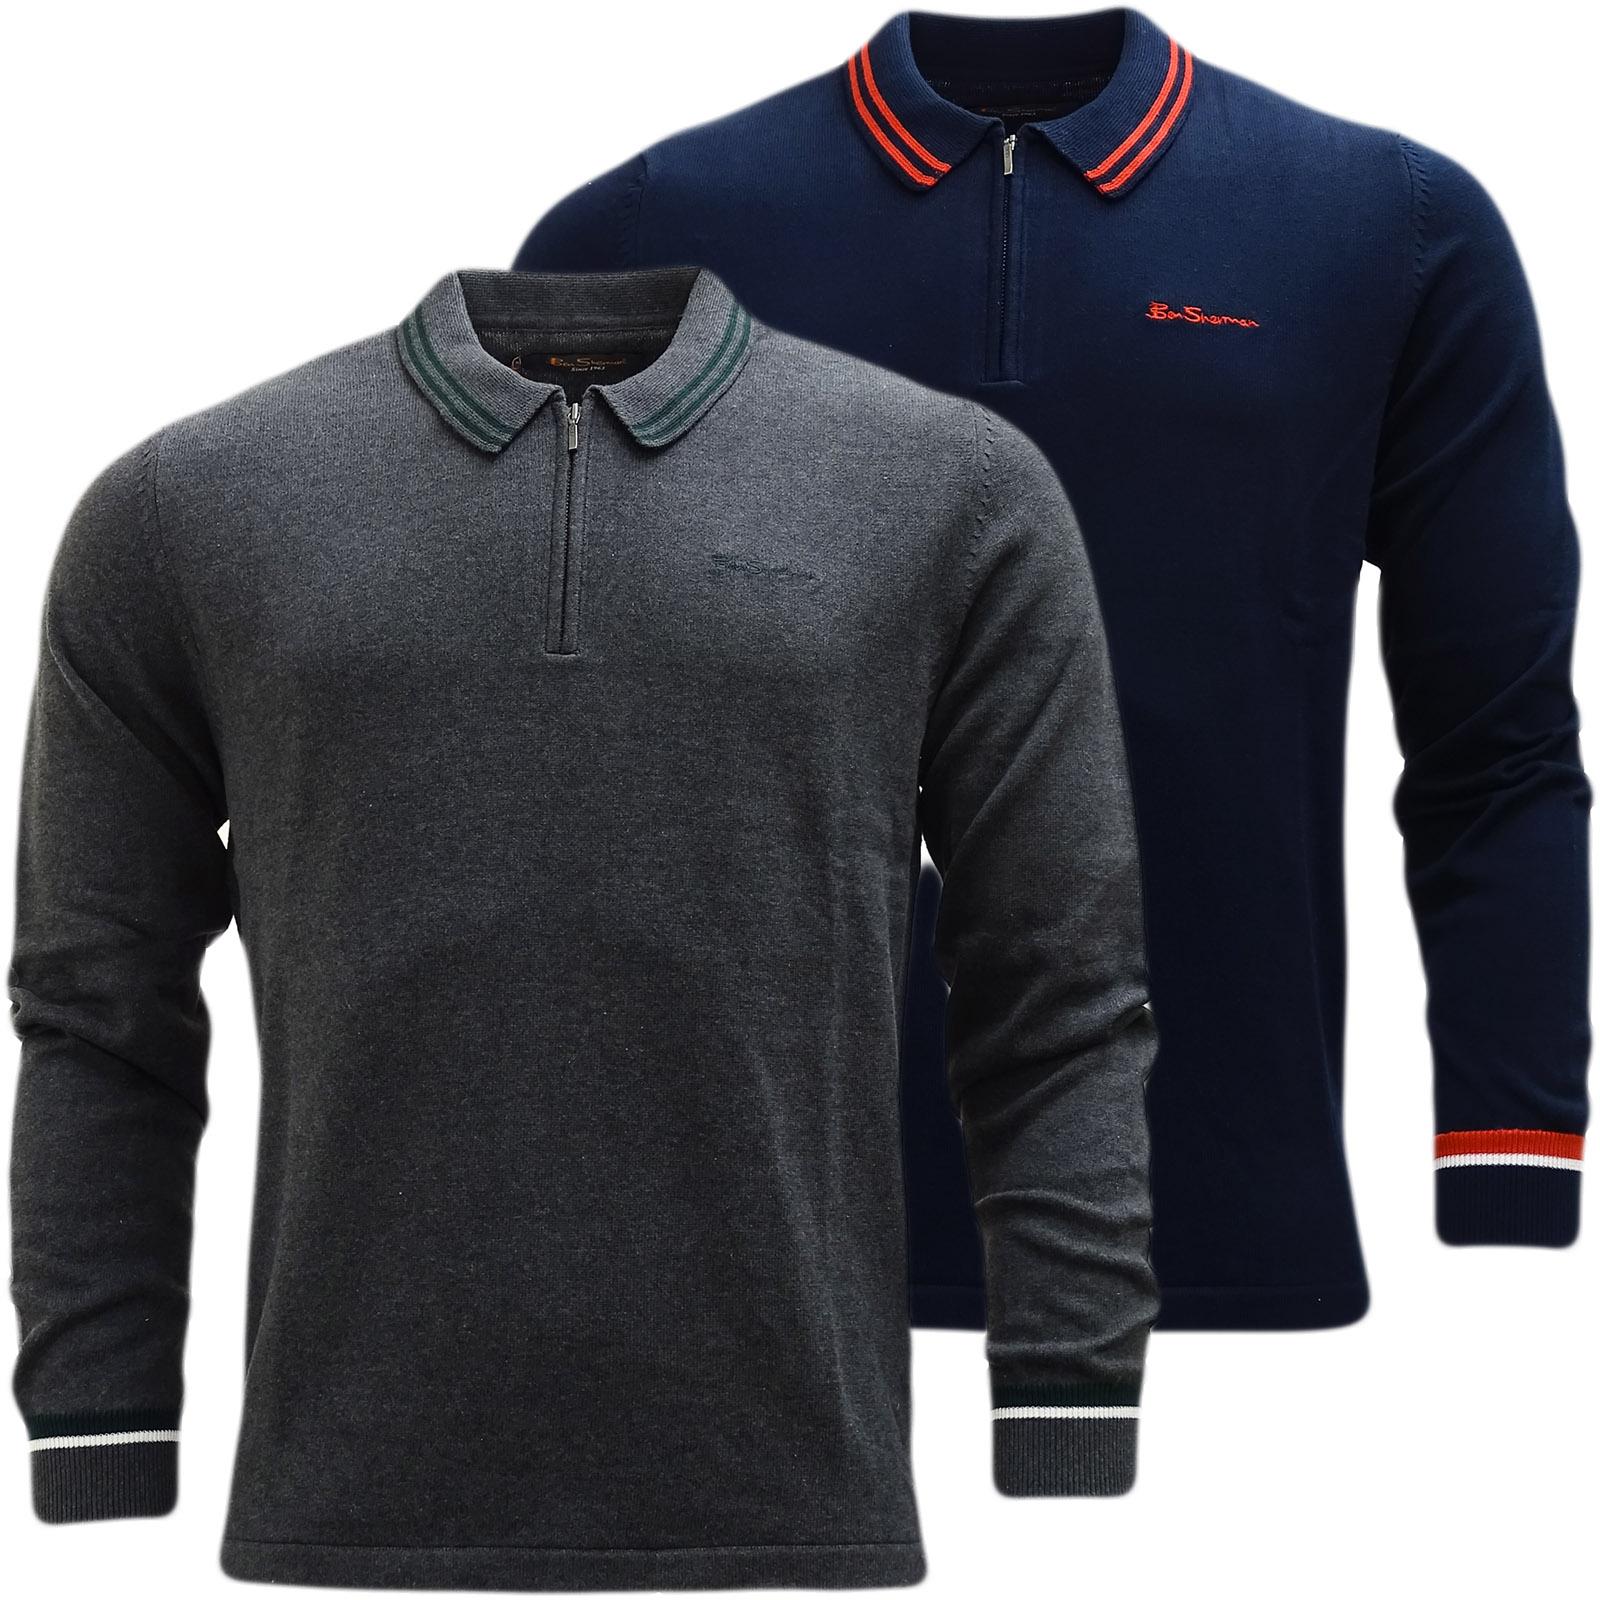 ben sherman knitted long sleeve polo shirt 48618 ben sherman mr h menswear. Black Bedroom Furniture Sets. Home Design Ideas